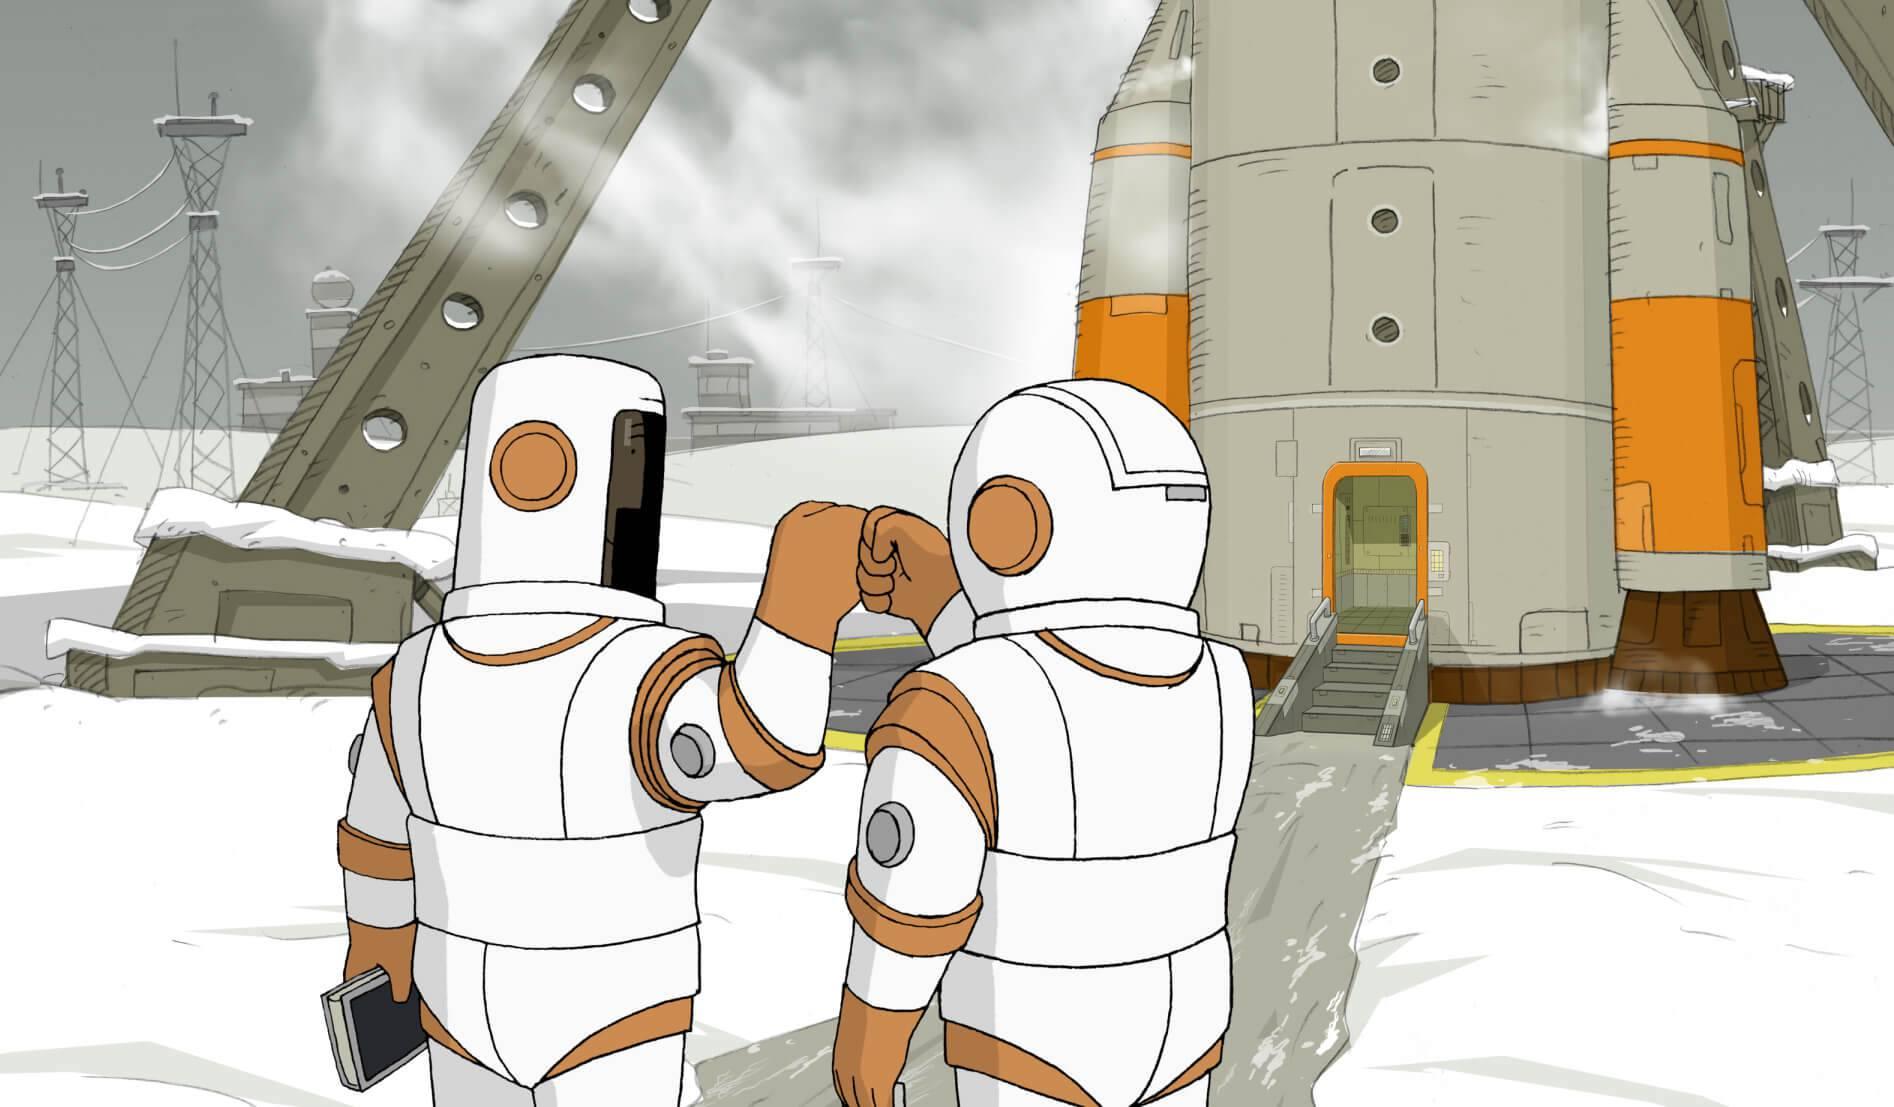 Ron Diamond's Animation Show of Shows goes non-profit